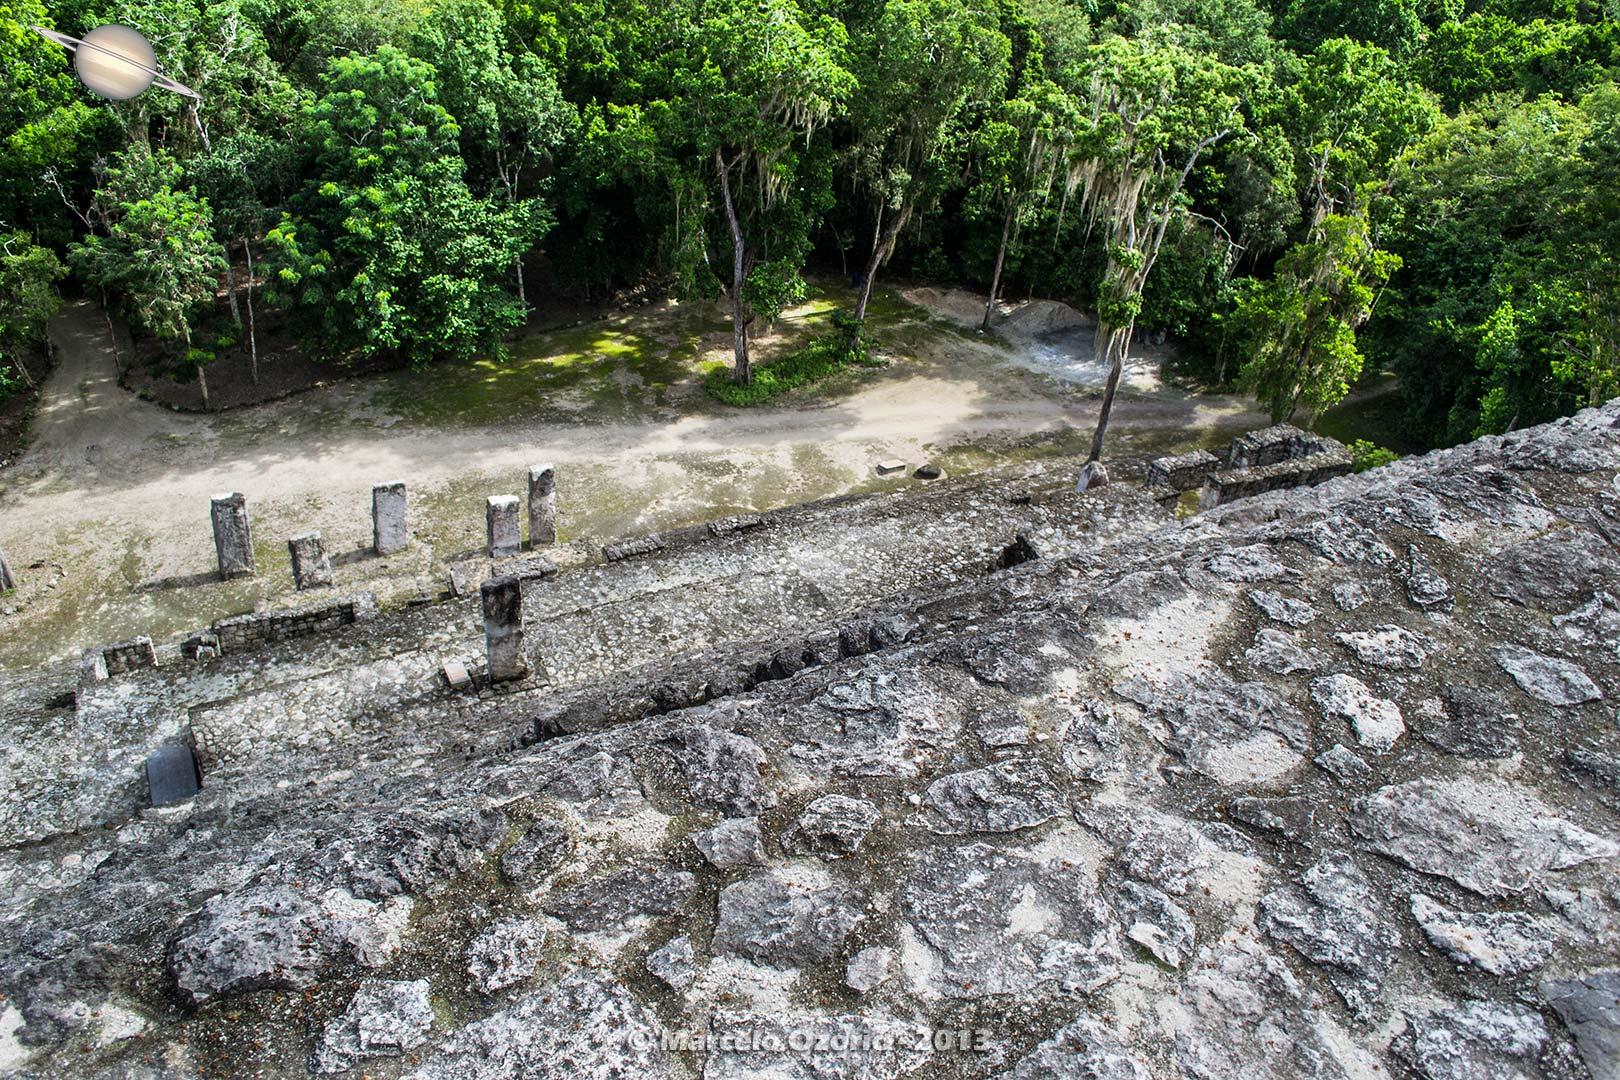 calakmul mayan civilization mexico 14 - Calakmul, City of the Two Adjacent Pyramids - Mexico